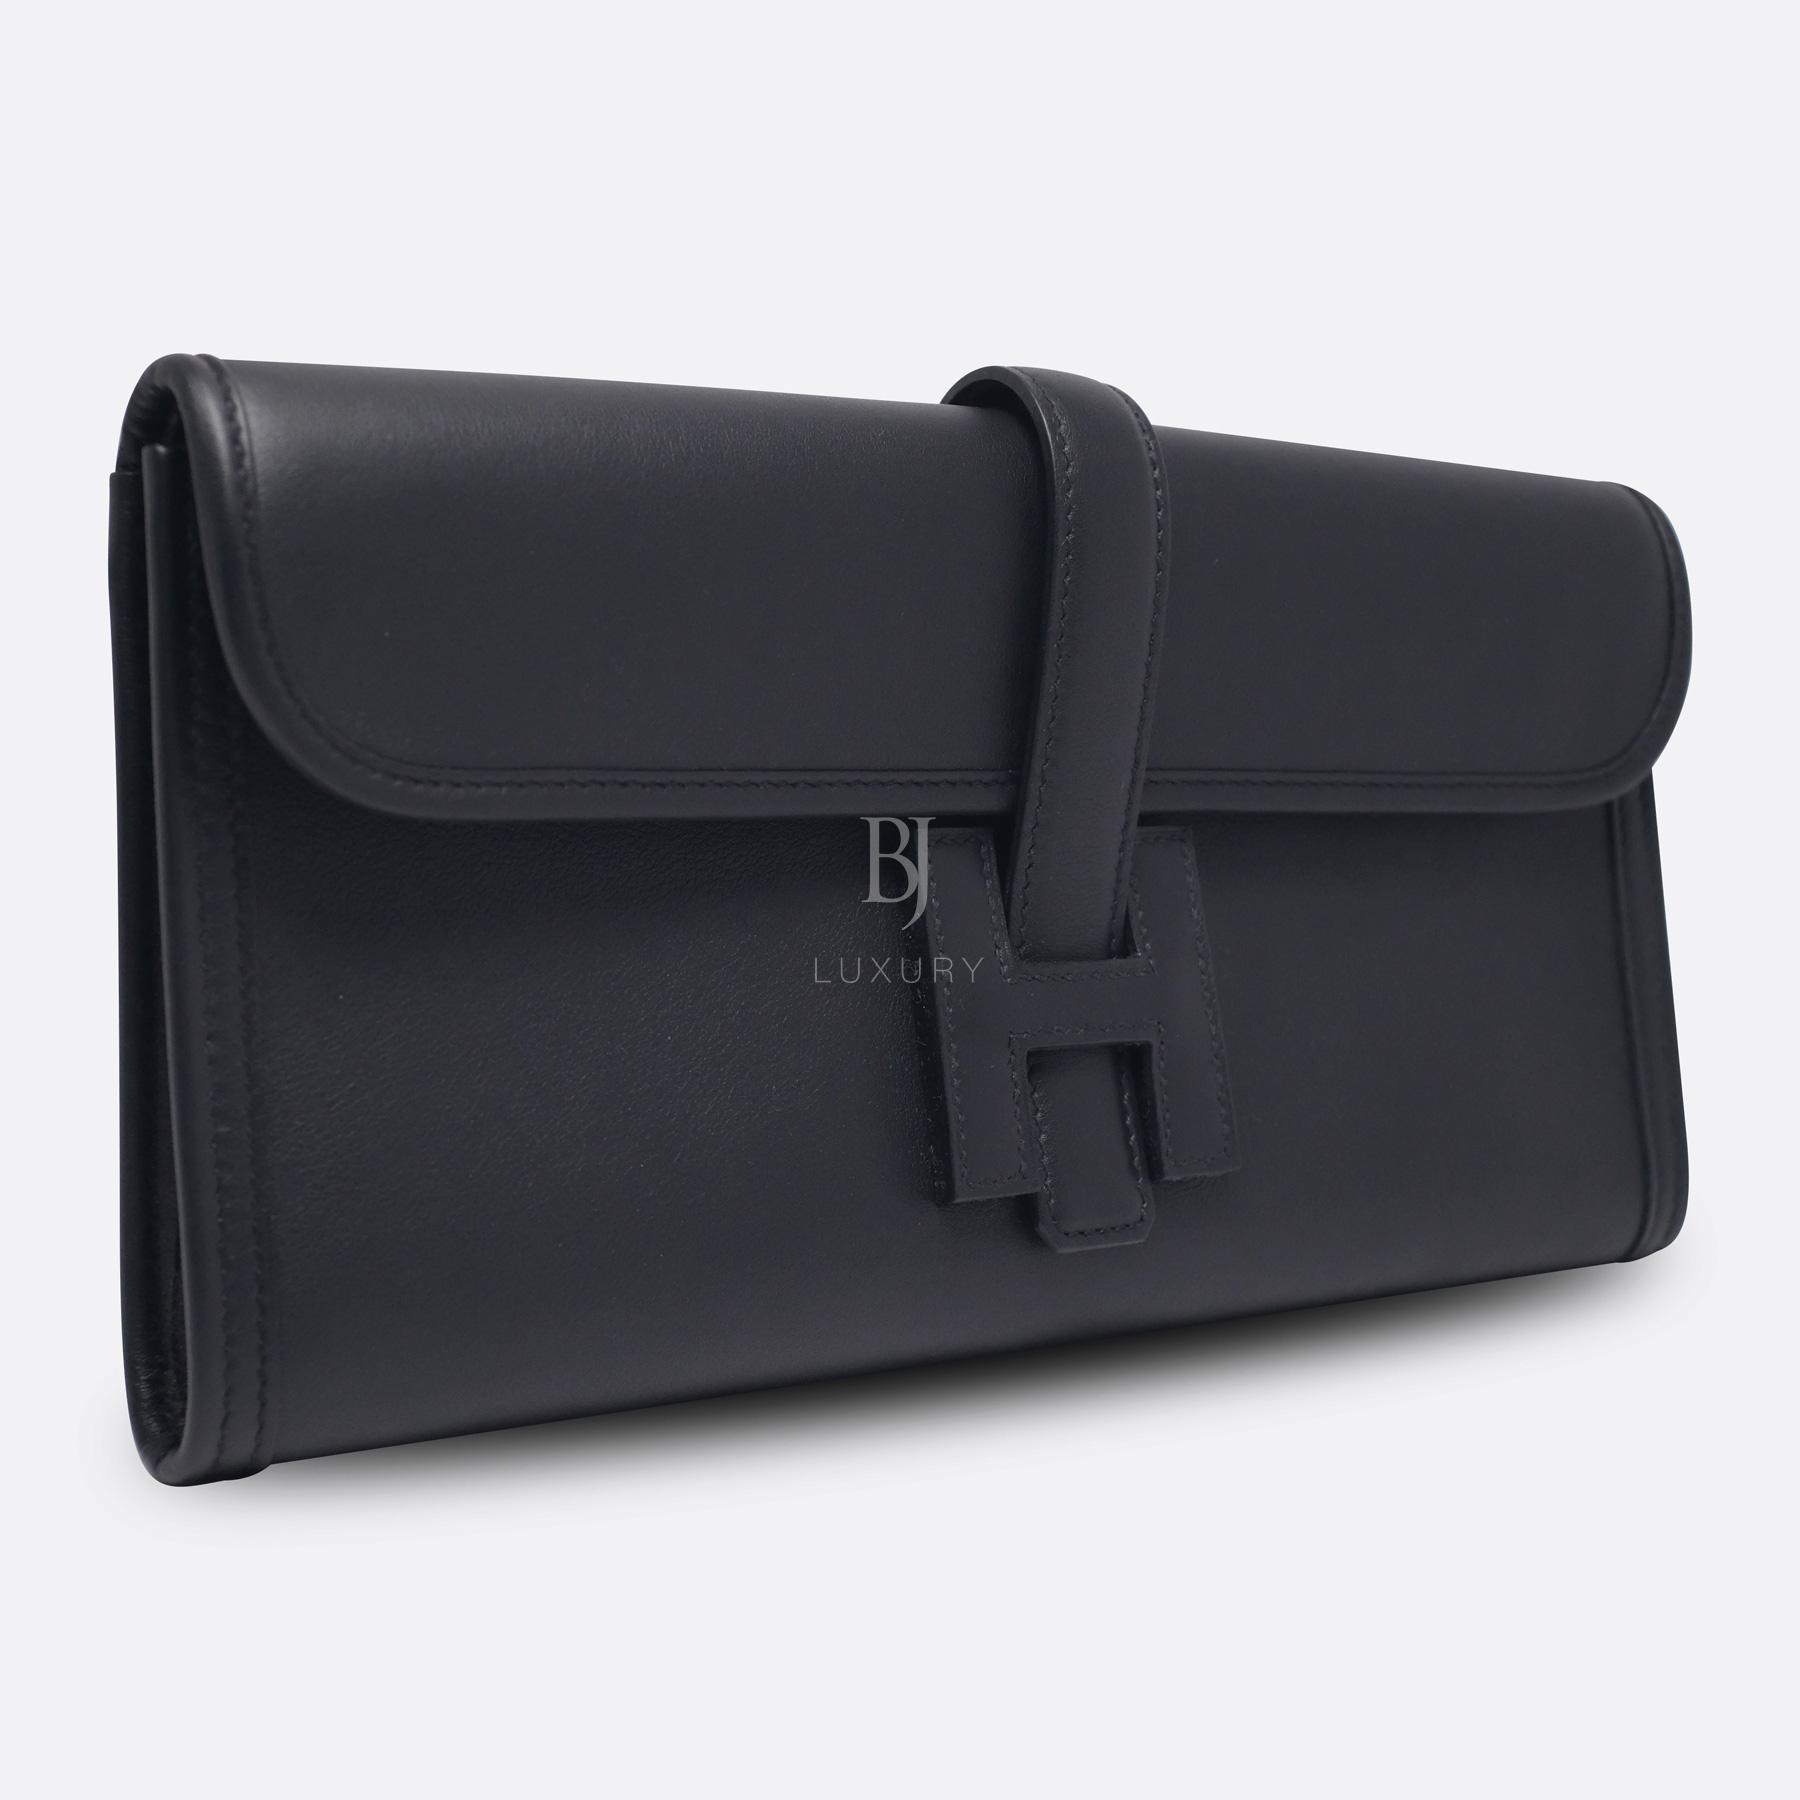 Hermes Jige 29 Black Swift BJ Luxury 3.jpg